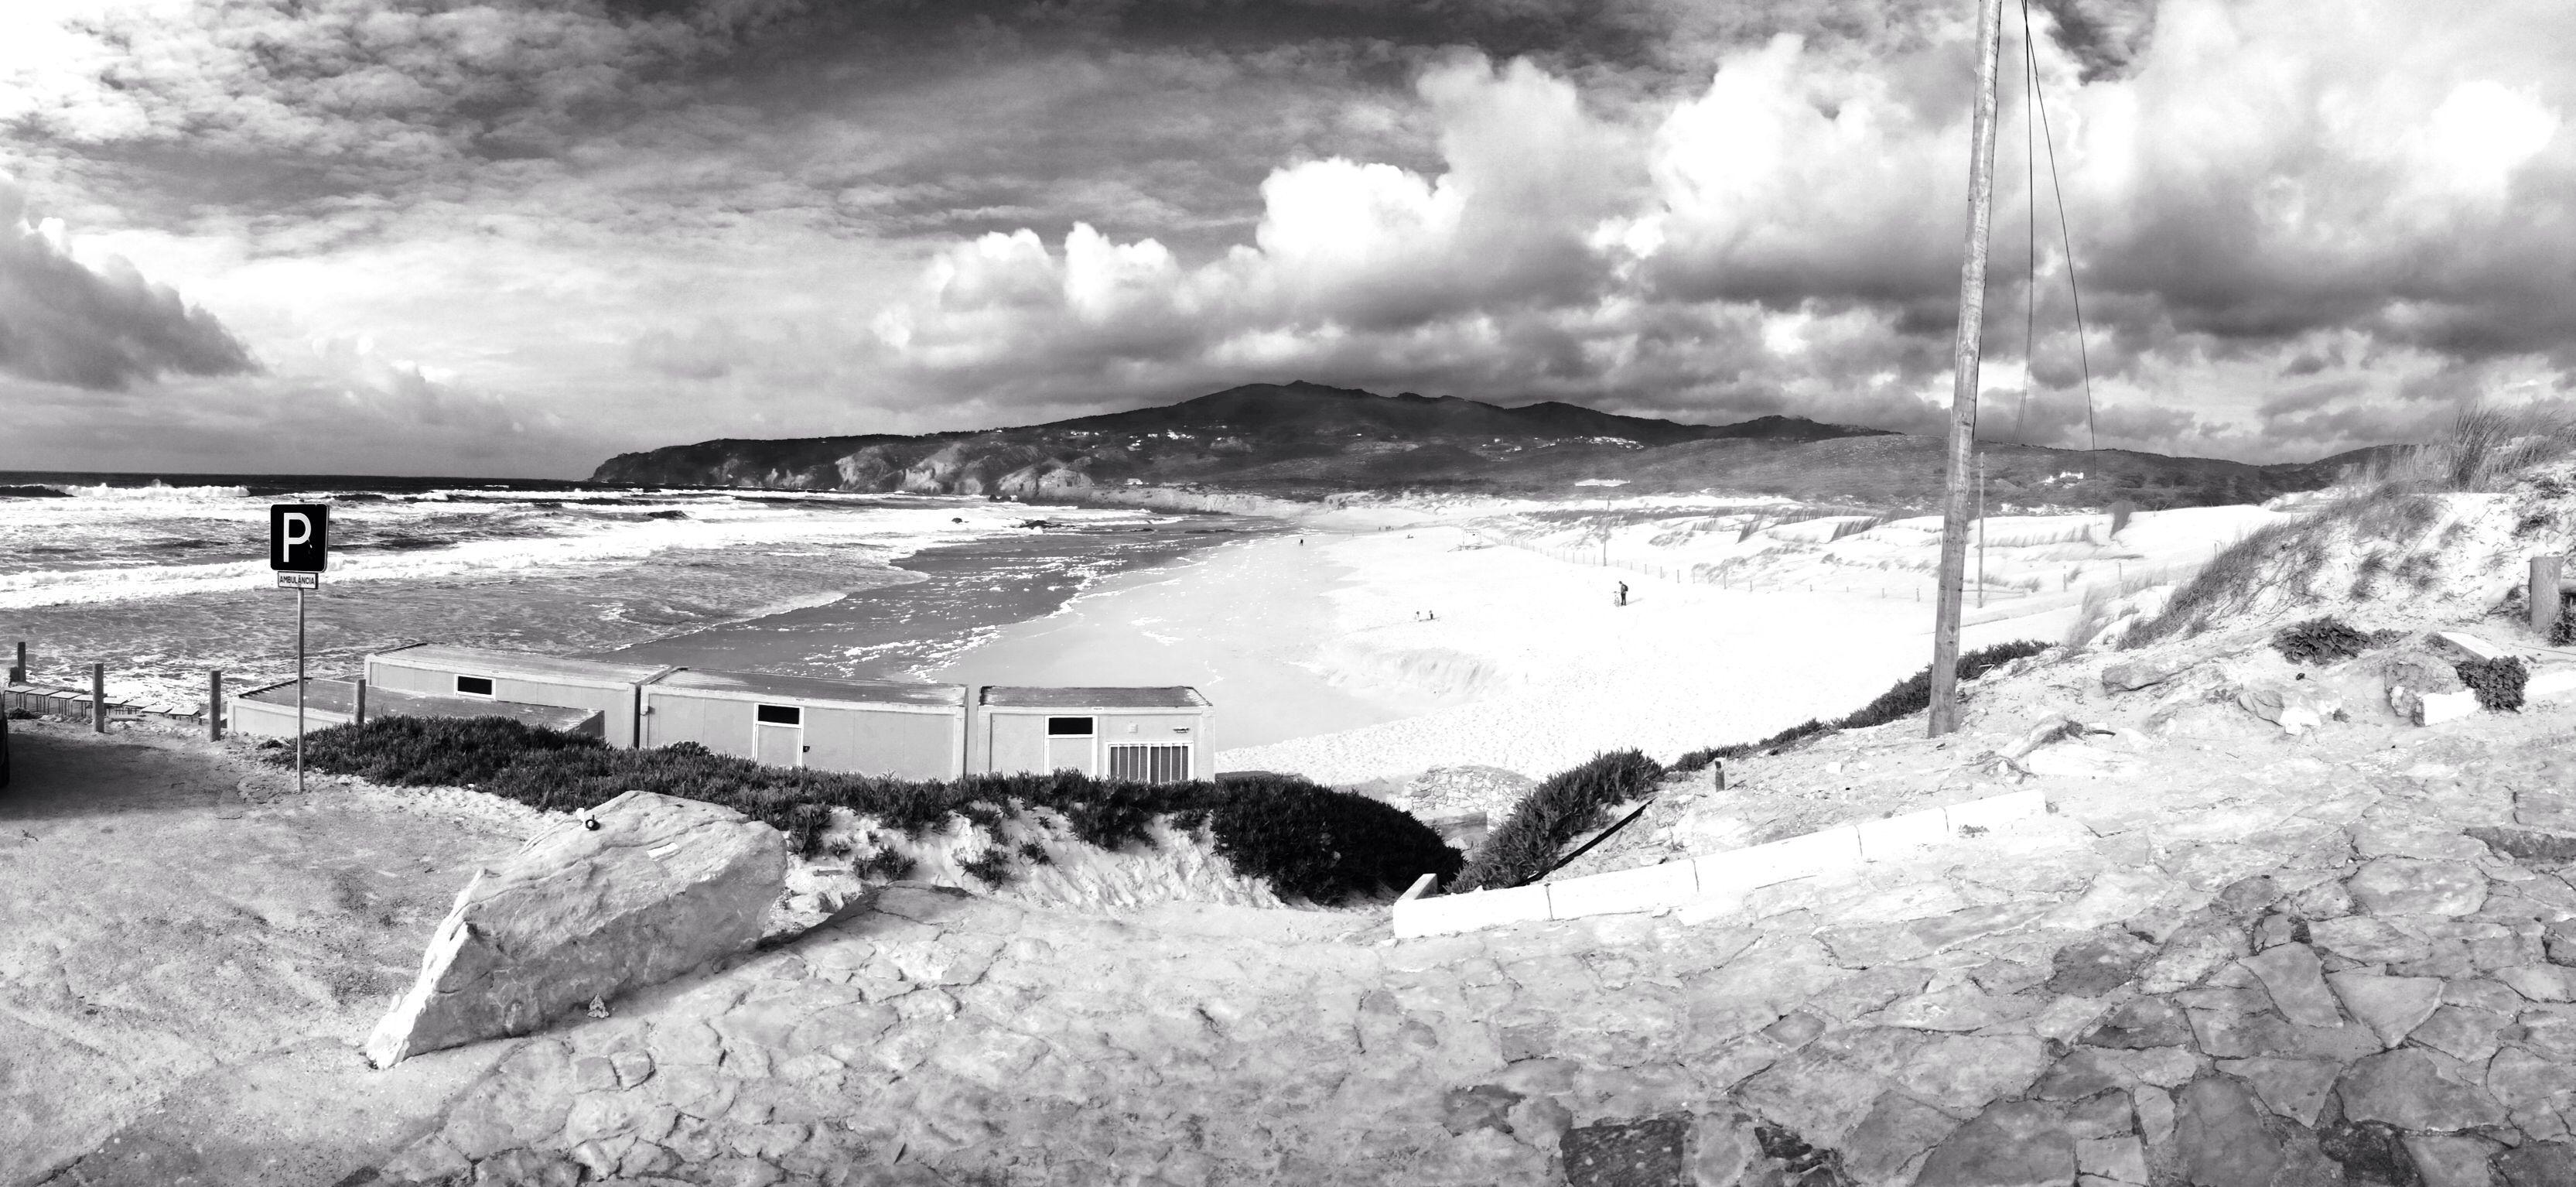 Guincho beach 'boa vista'